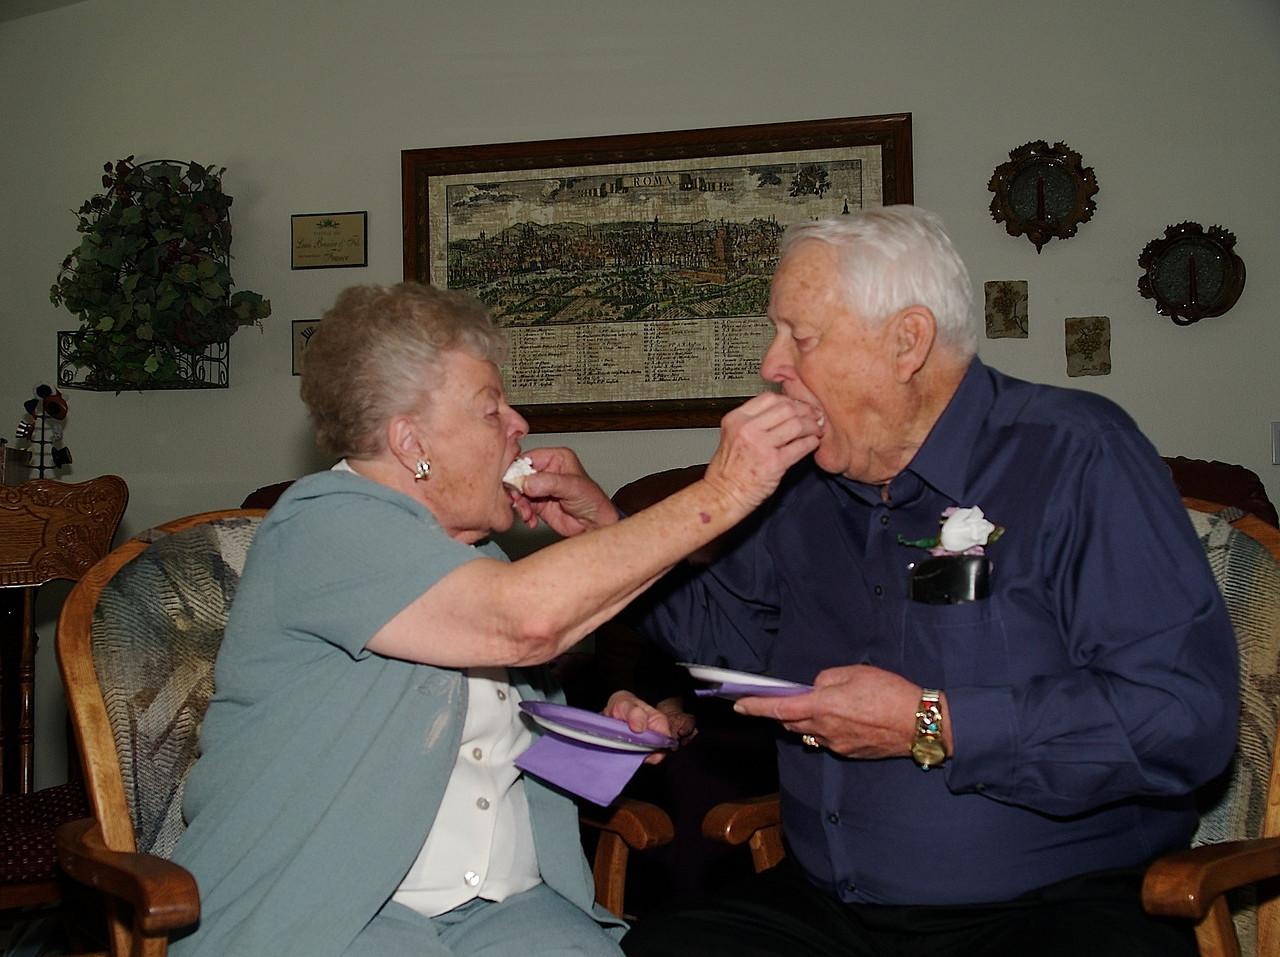 Feeding each other cake.